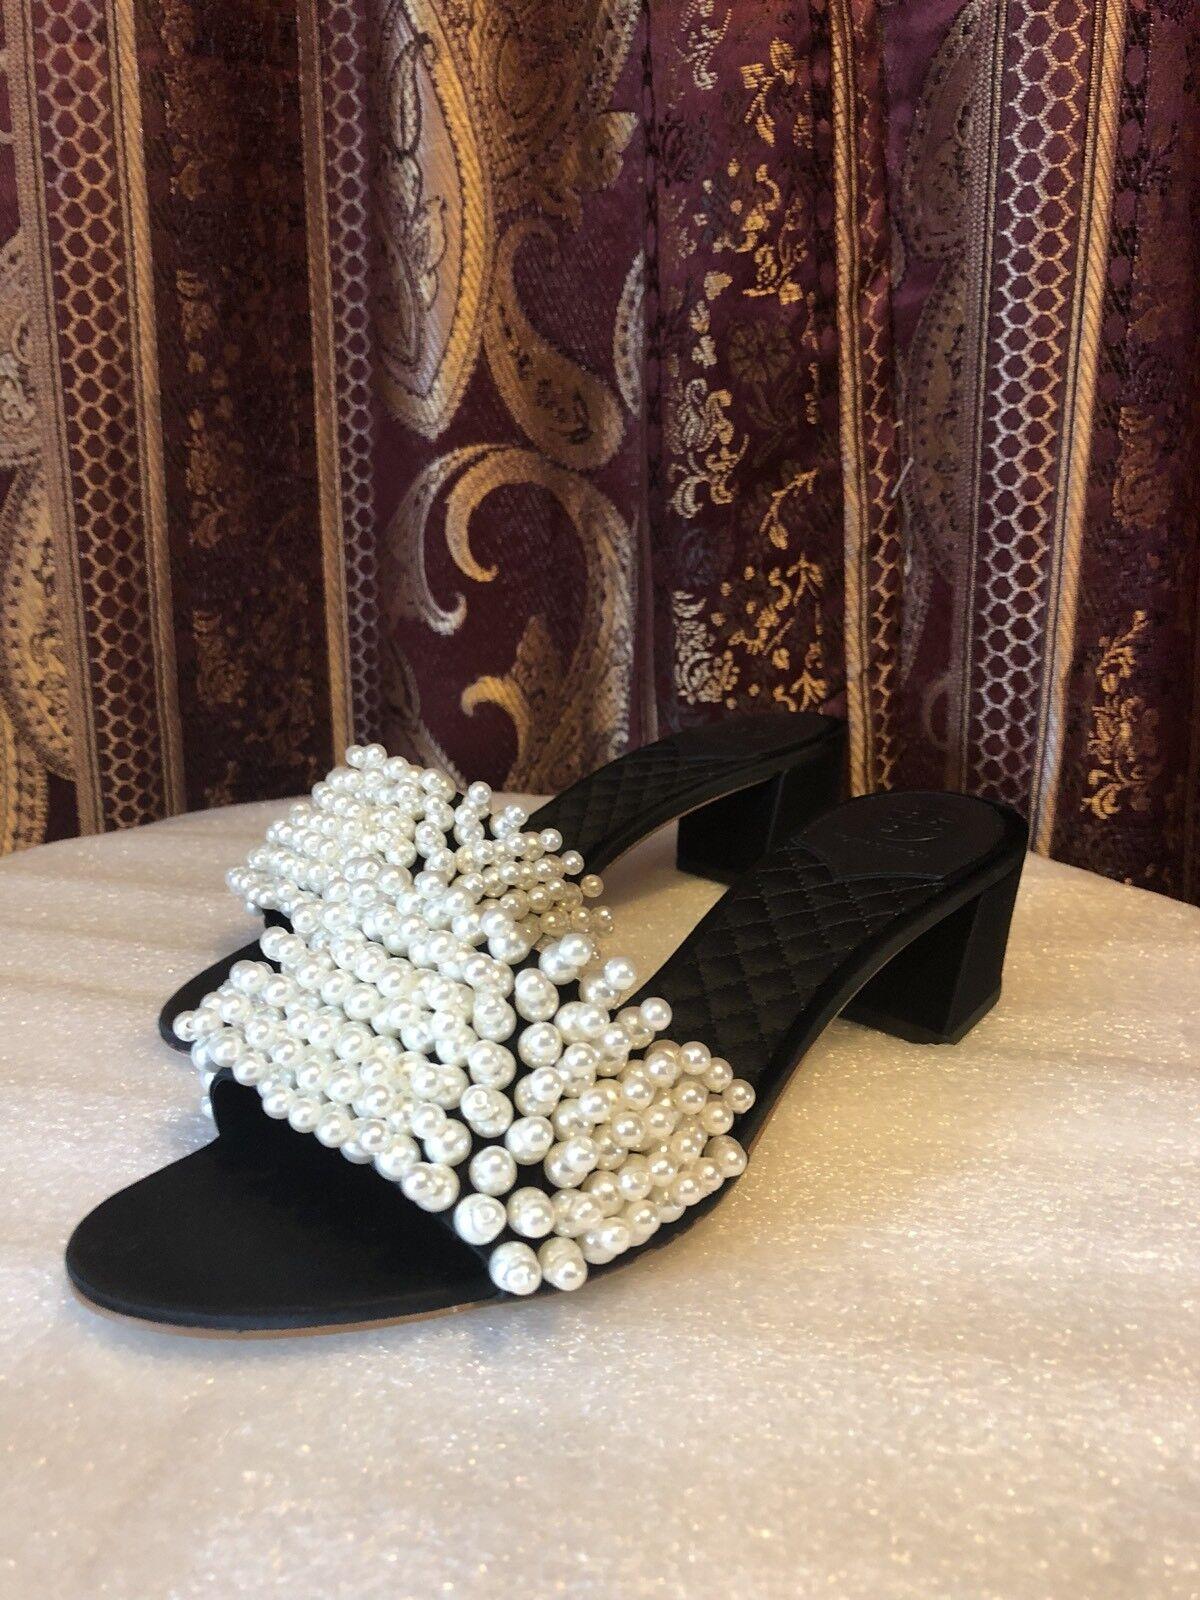 Tory Burch Tatiana 45mm Slide Slide Slide Sandals, Black (8.5) cbdda0